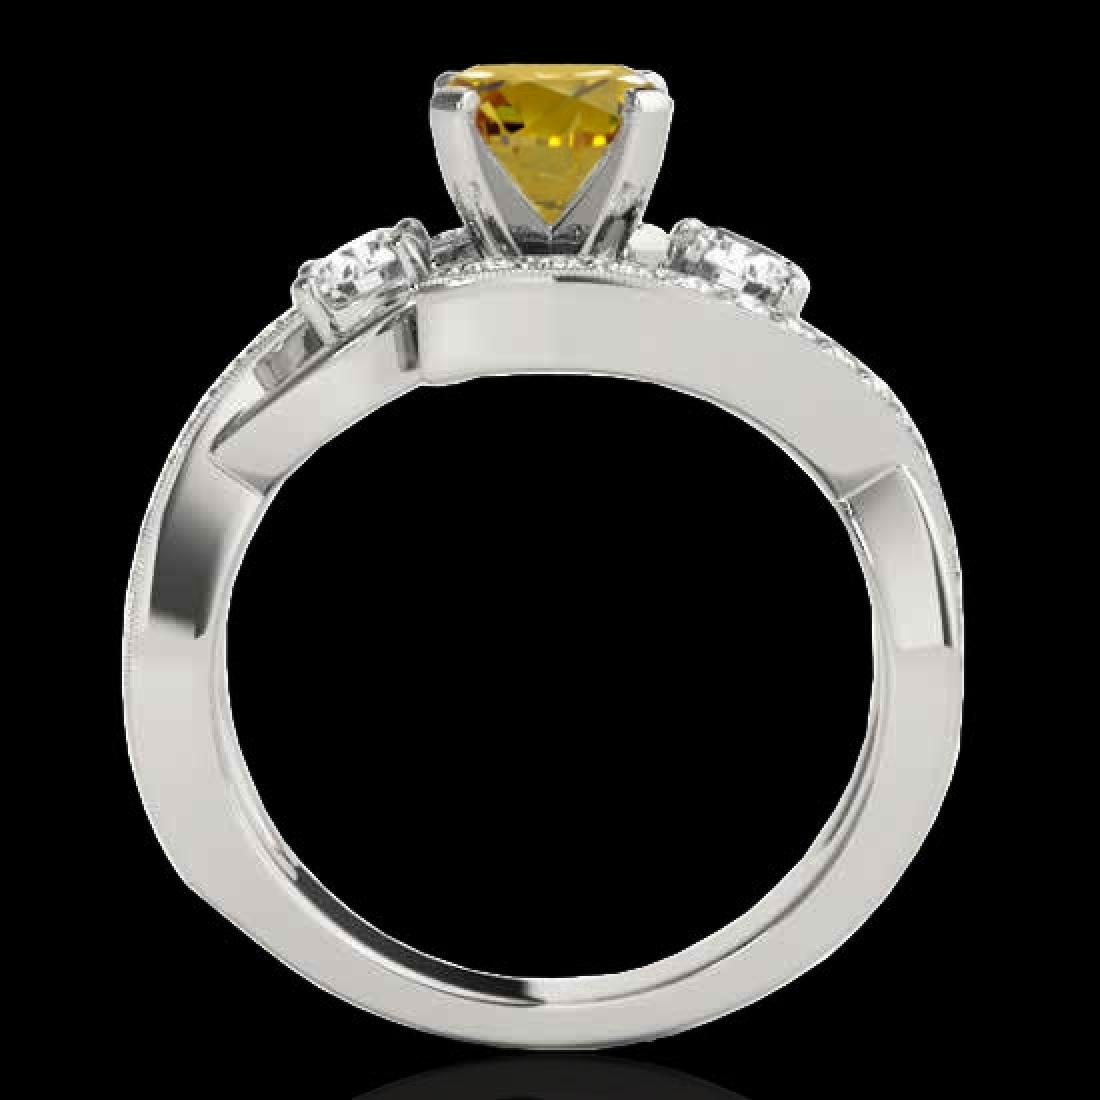 2.01 CTW Certified Si Intense Yellow Diamond Bypass - 2